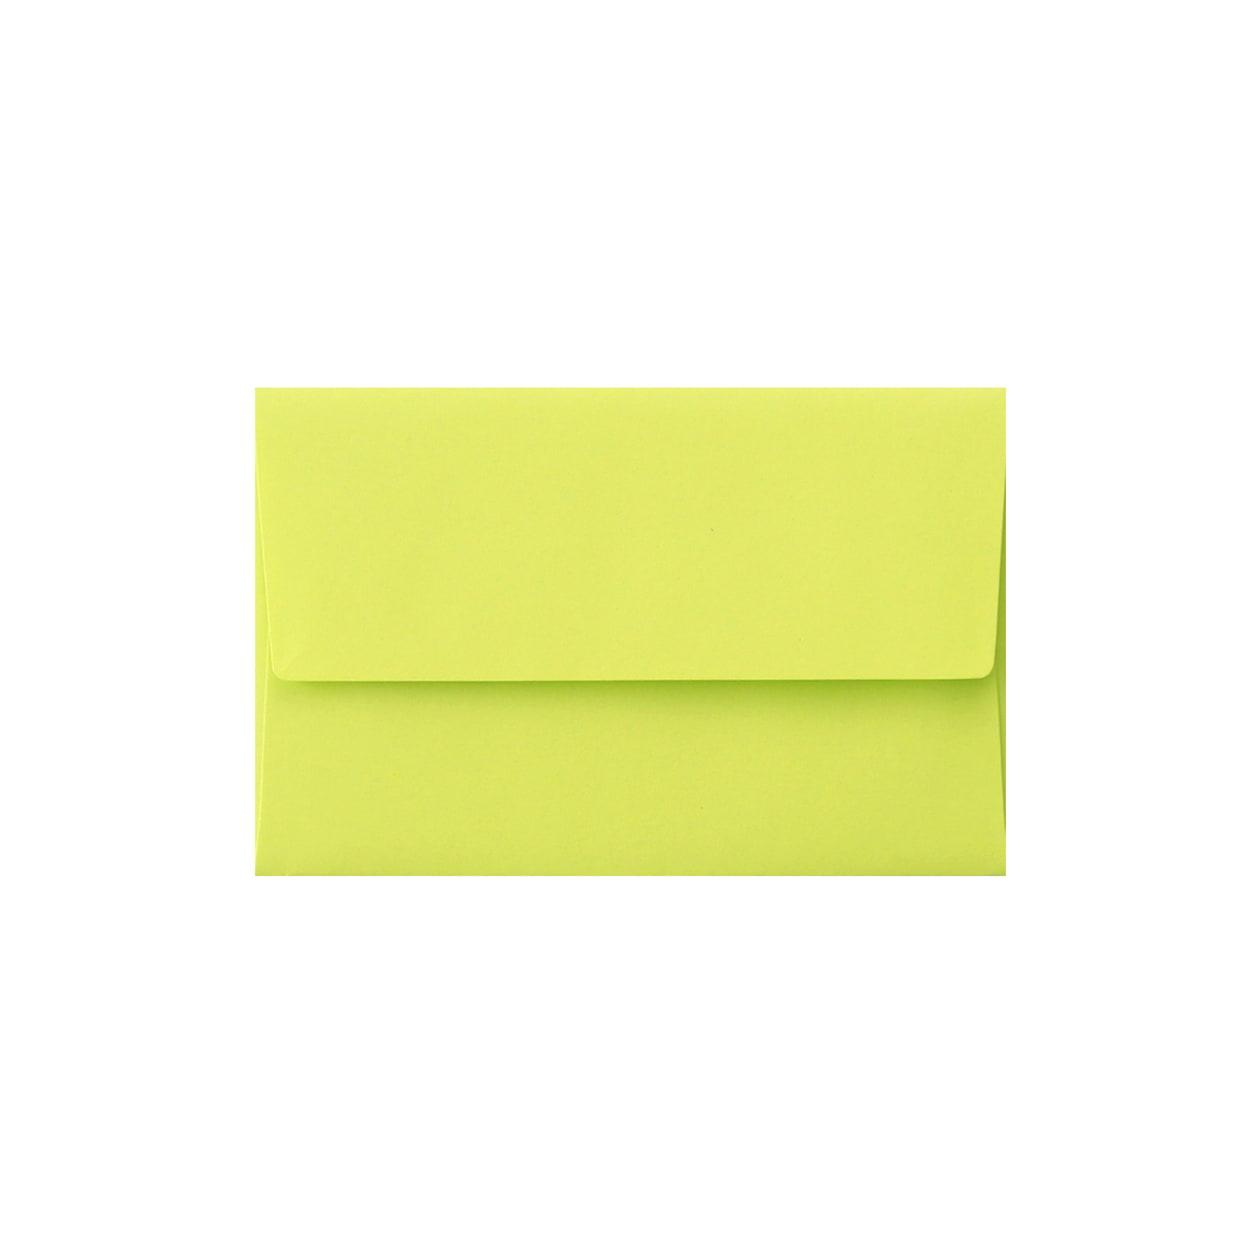 NEカマス封筒 上質カラー グリーン 90.7g